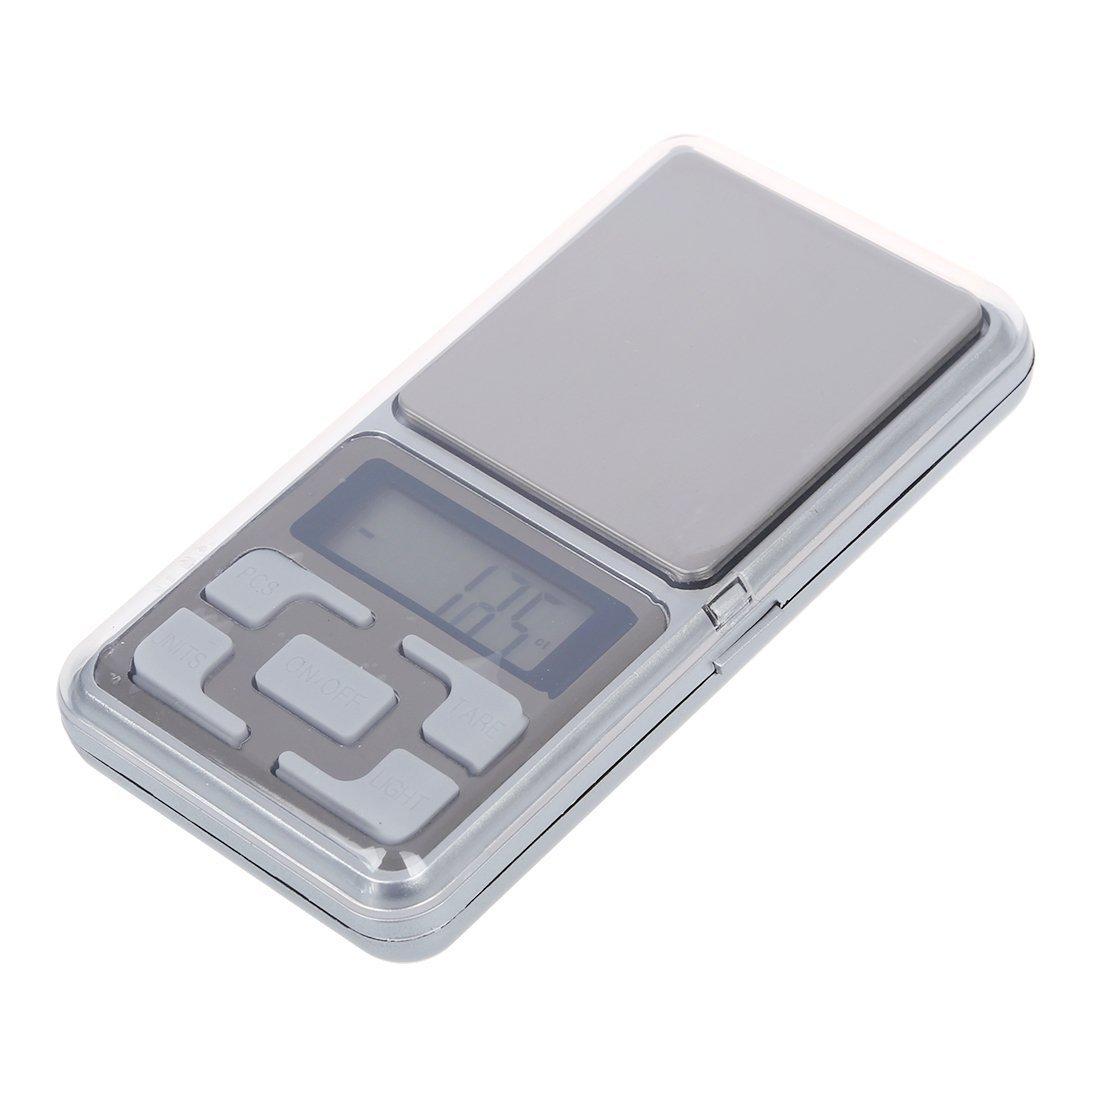 SODIAL(R) Mini Bascula Balanza Digital 0.01g a 100g LCD Electronico Precision LEPEA2601